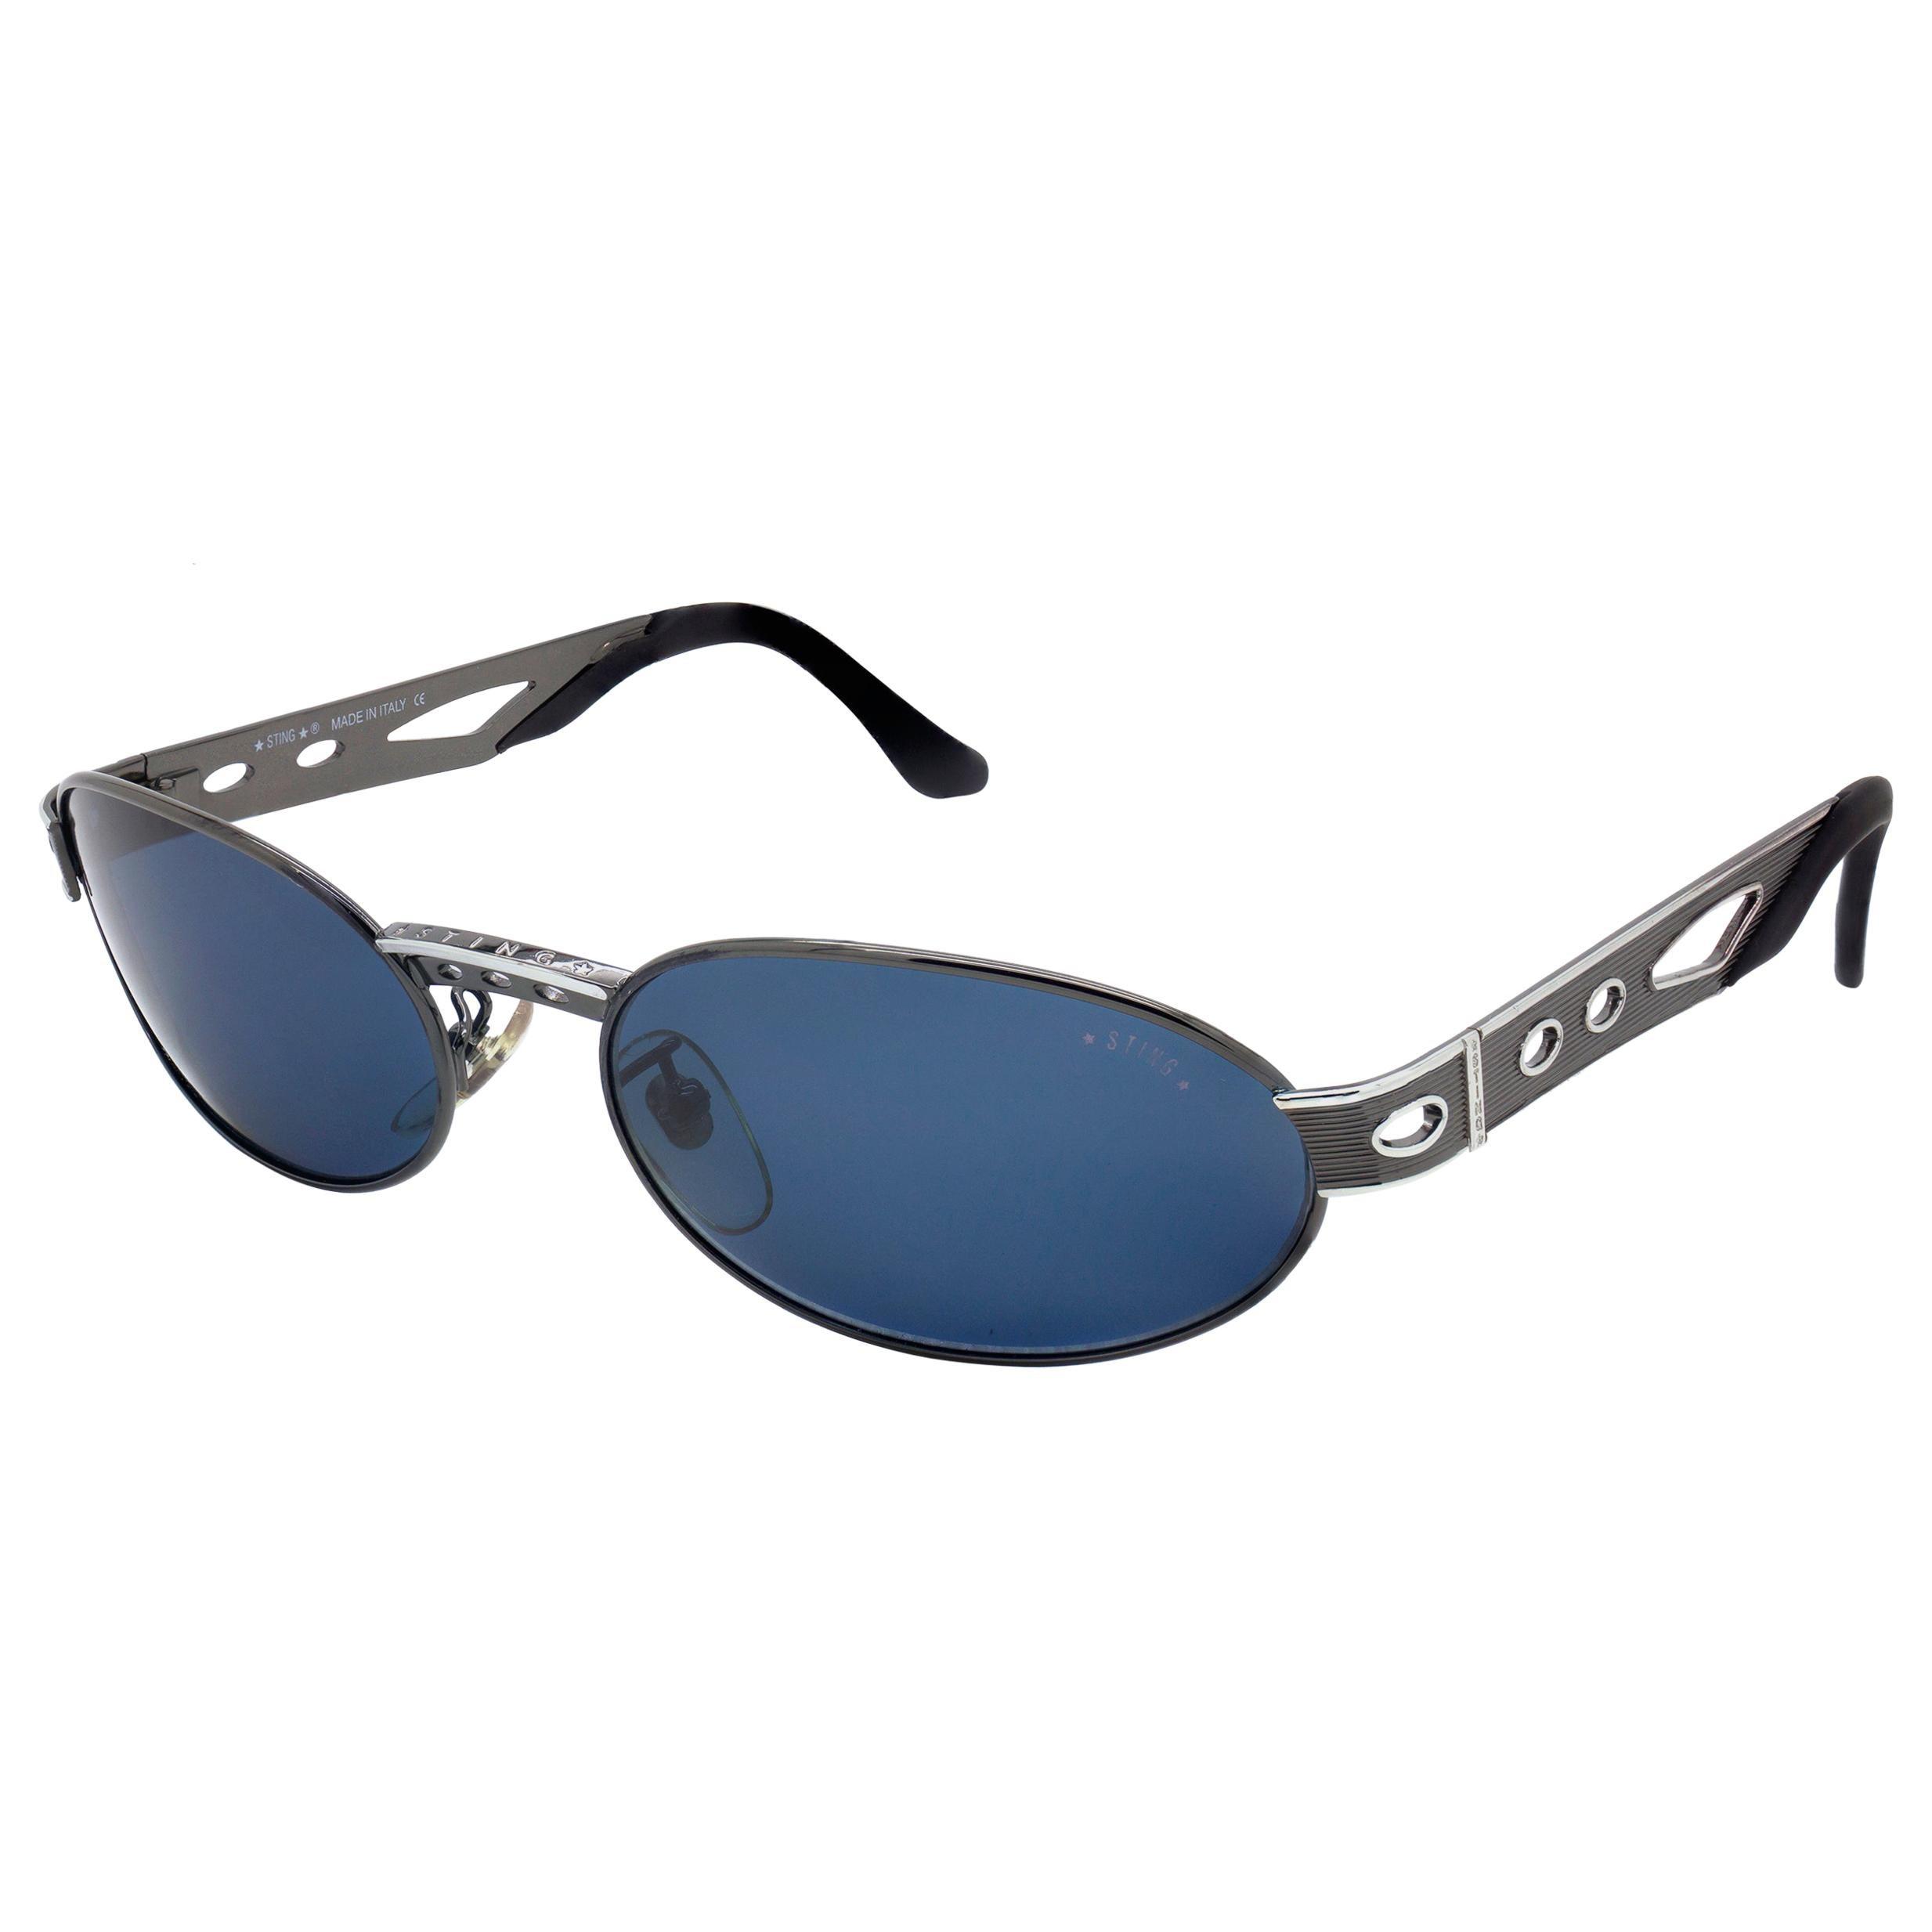 Sting wrap vintage sunglasses 90s